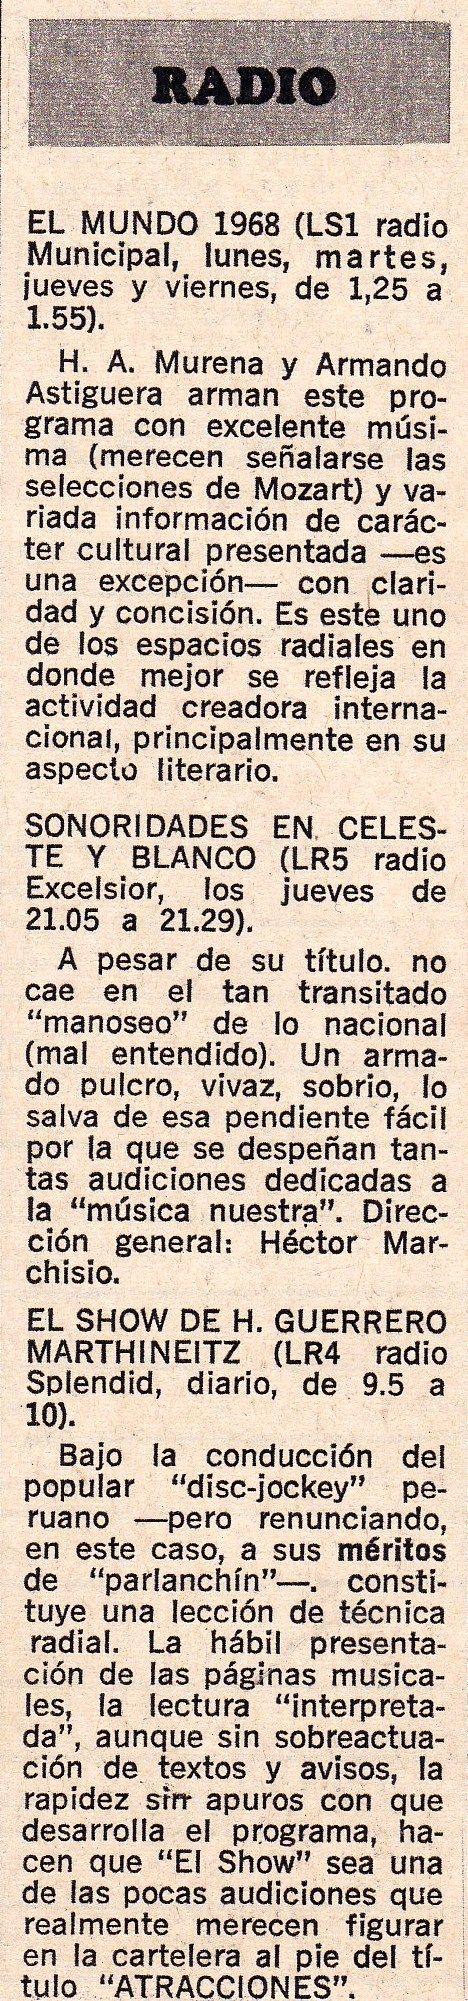 Comentario de programación radial de radios de Buenos Aires, publicada por revista PANORAMA de 1968.